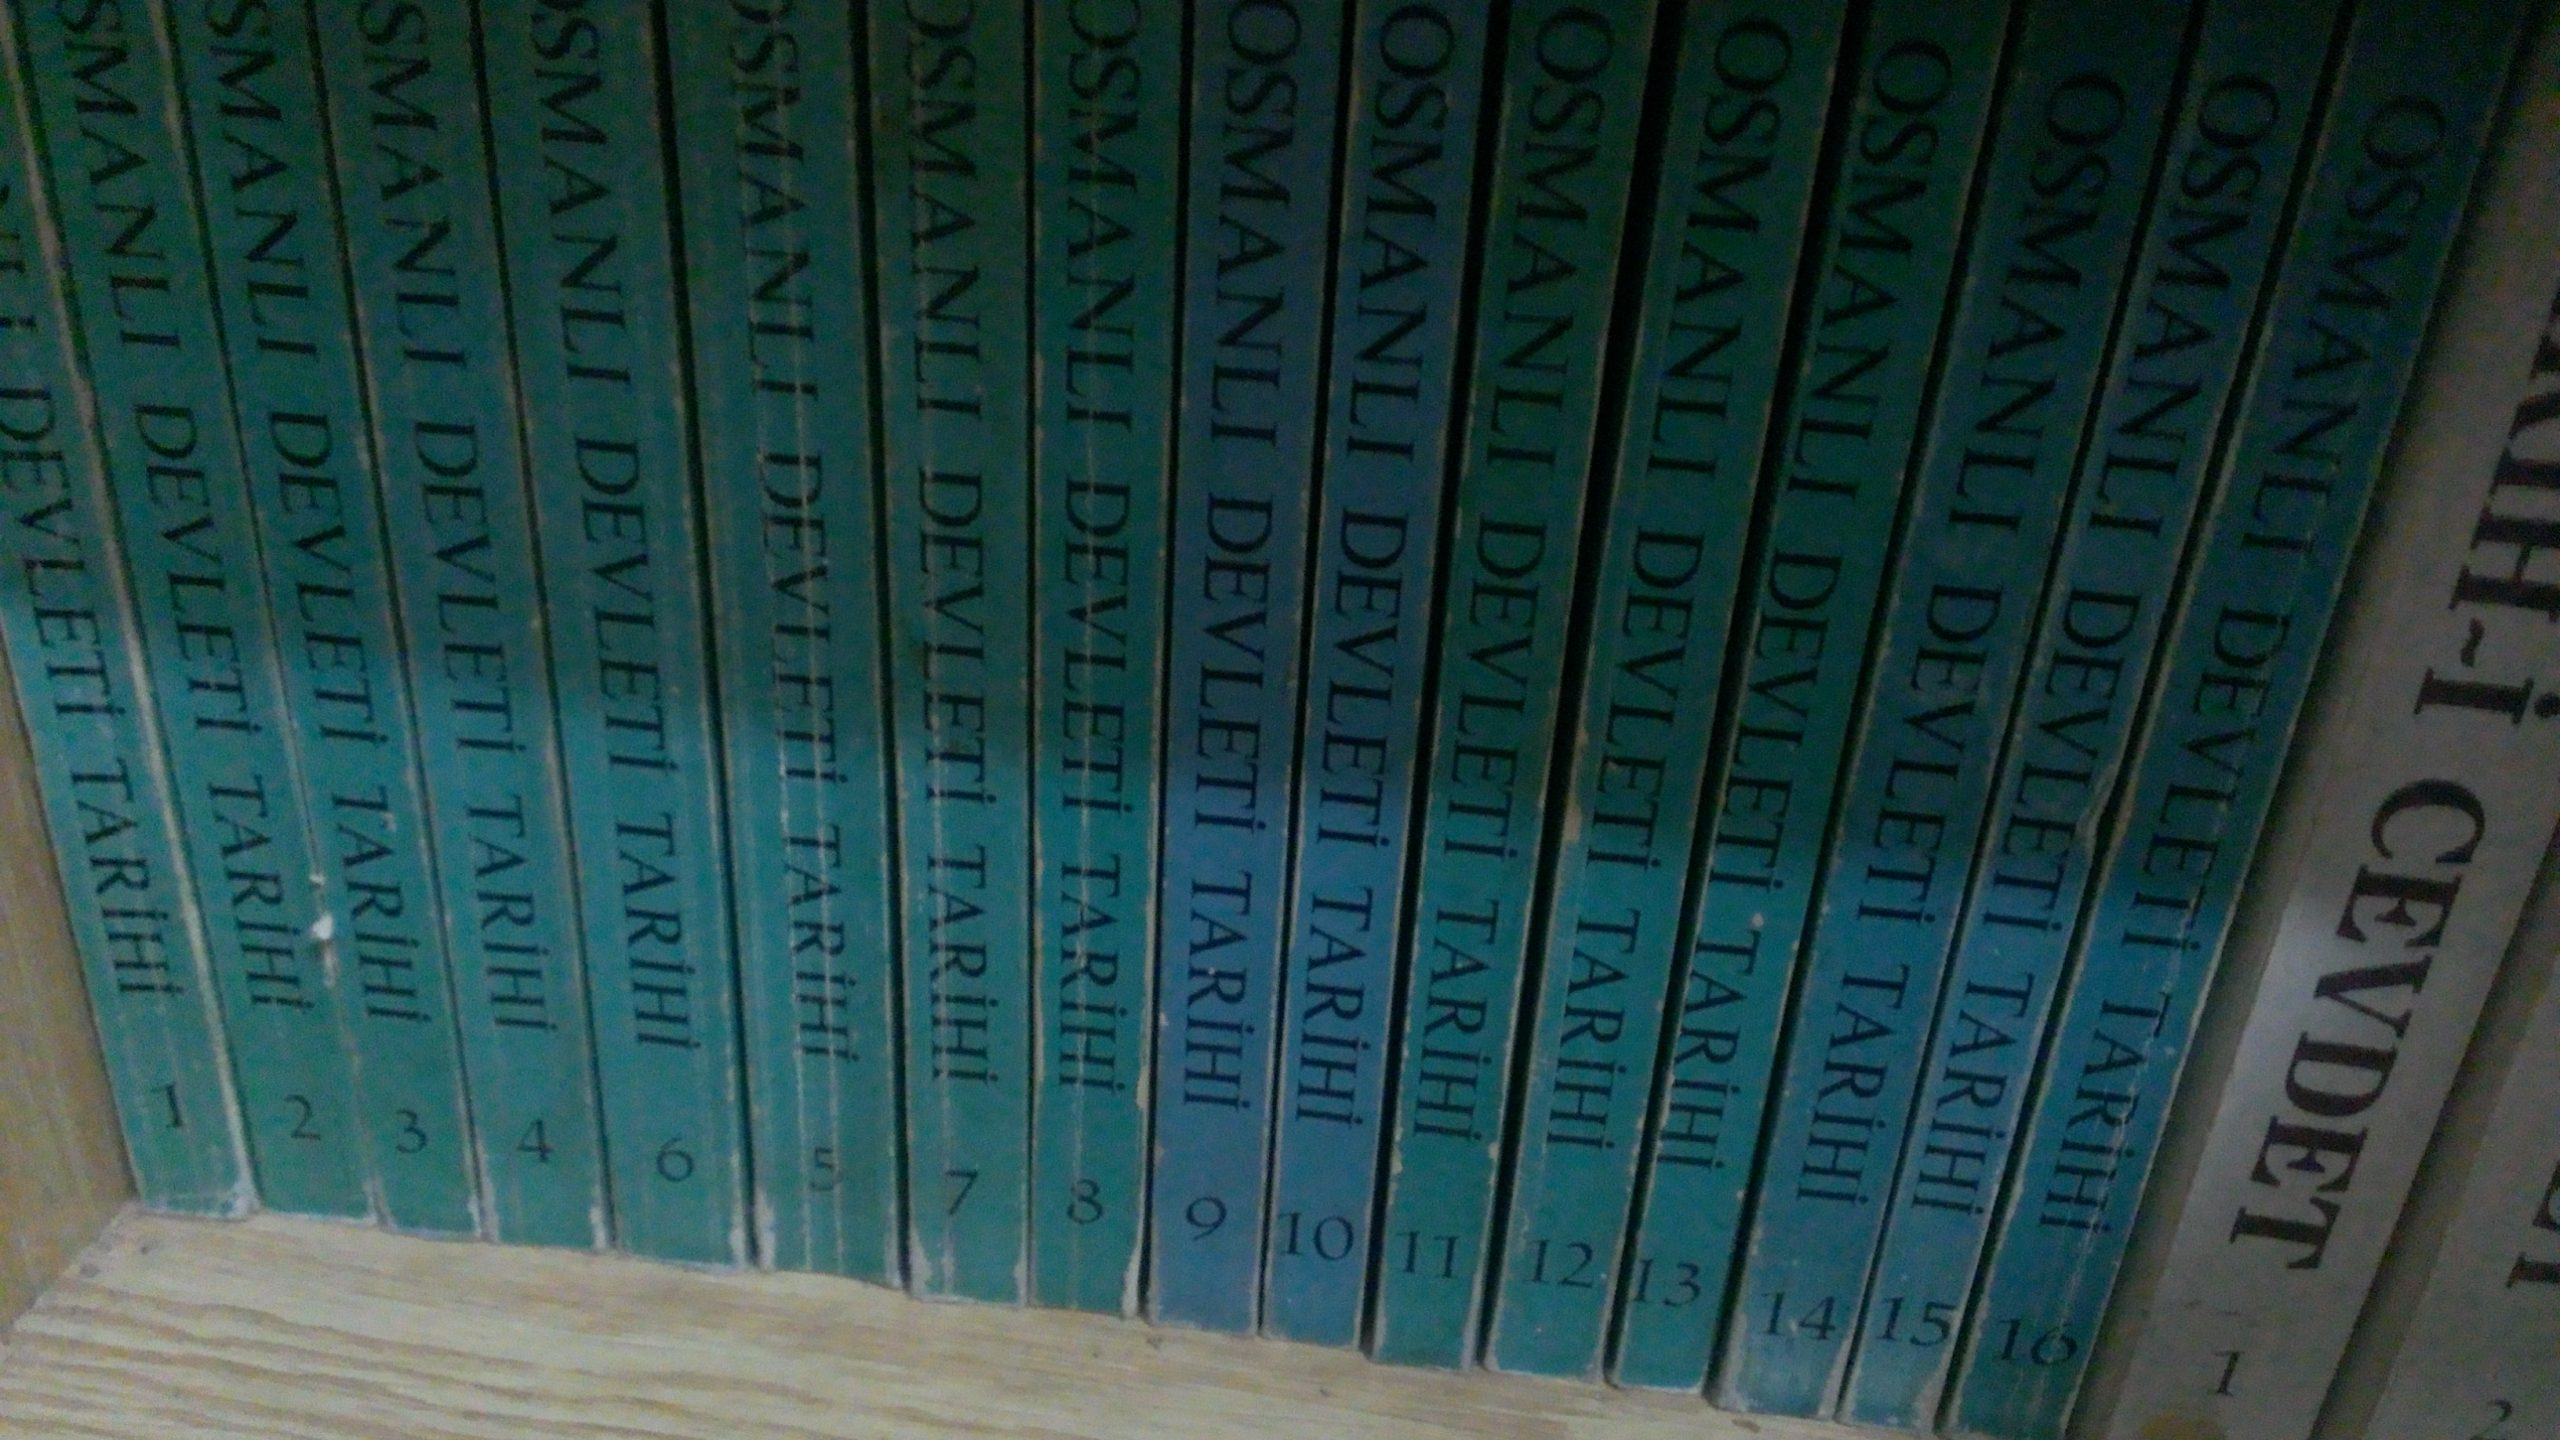 OSMANLI DEVLETİ TARİHİ /(toplam 16 cilt) HAMMER/ 150 TL